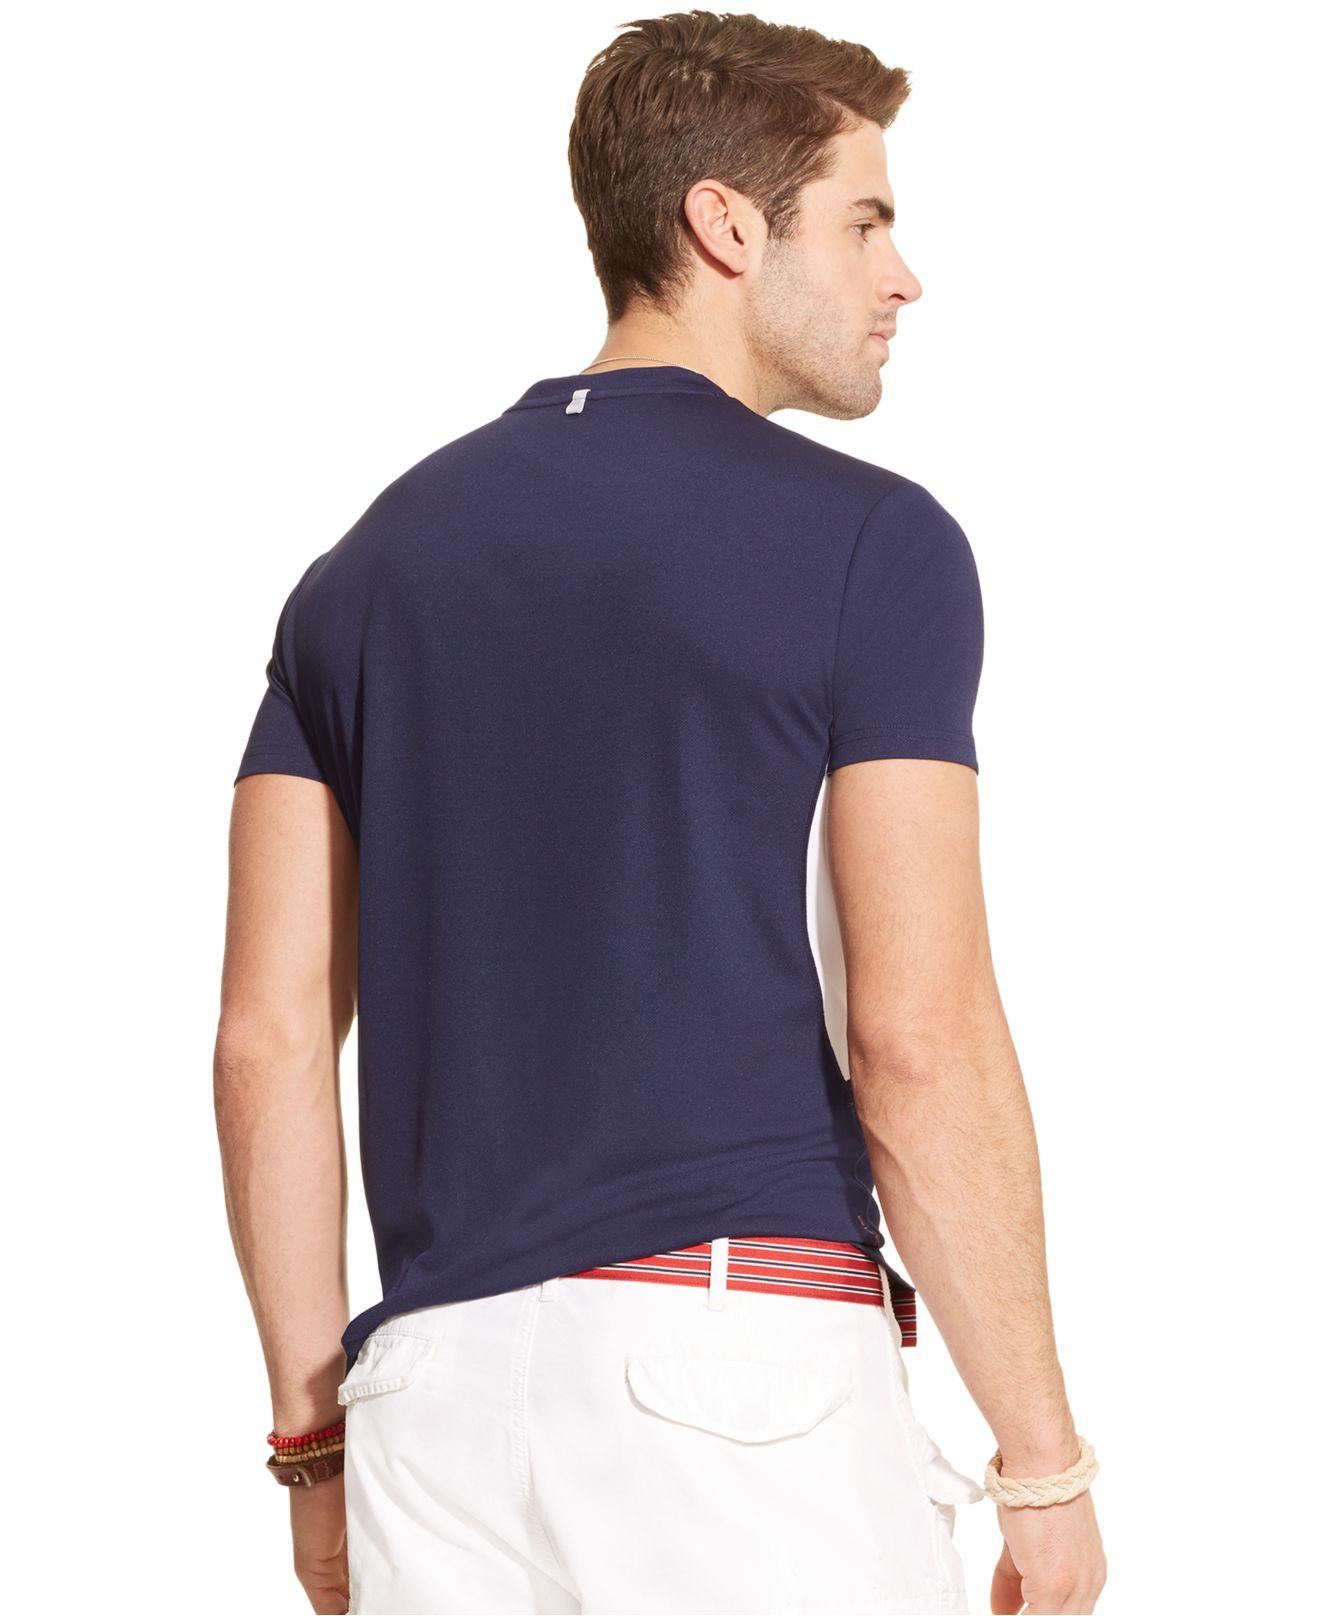 Lyst Polo Ralph Lauren Performance Jersey Crewneck T Shirt In Blue